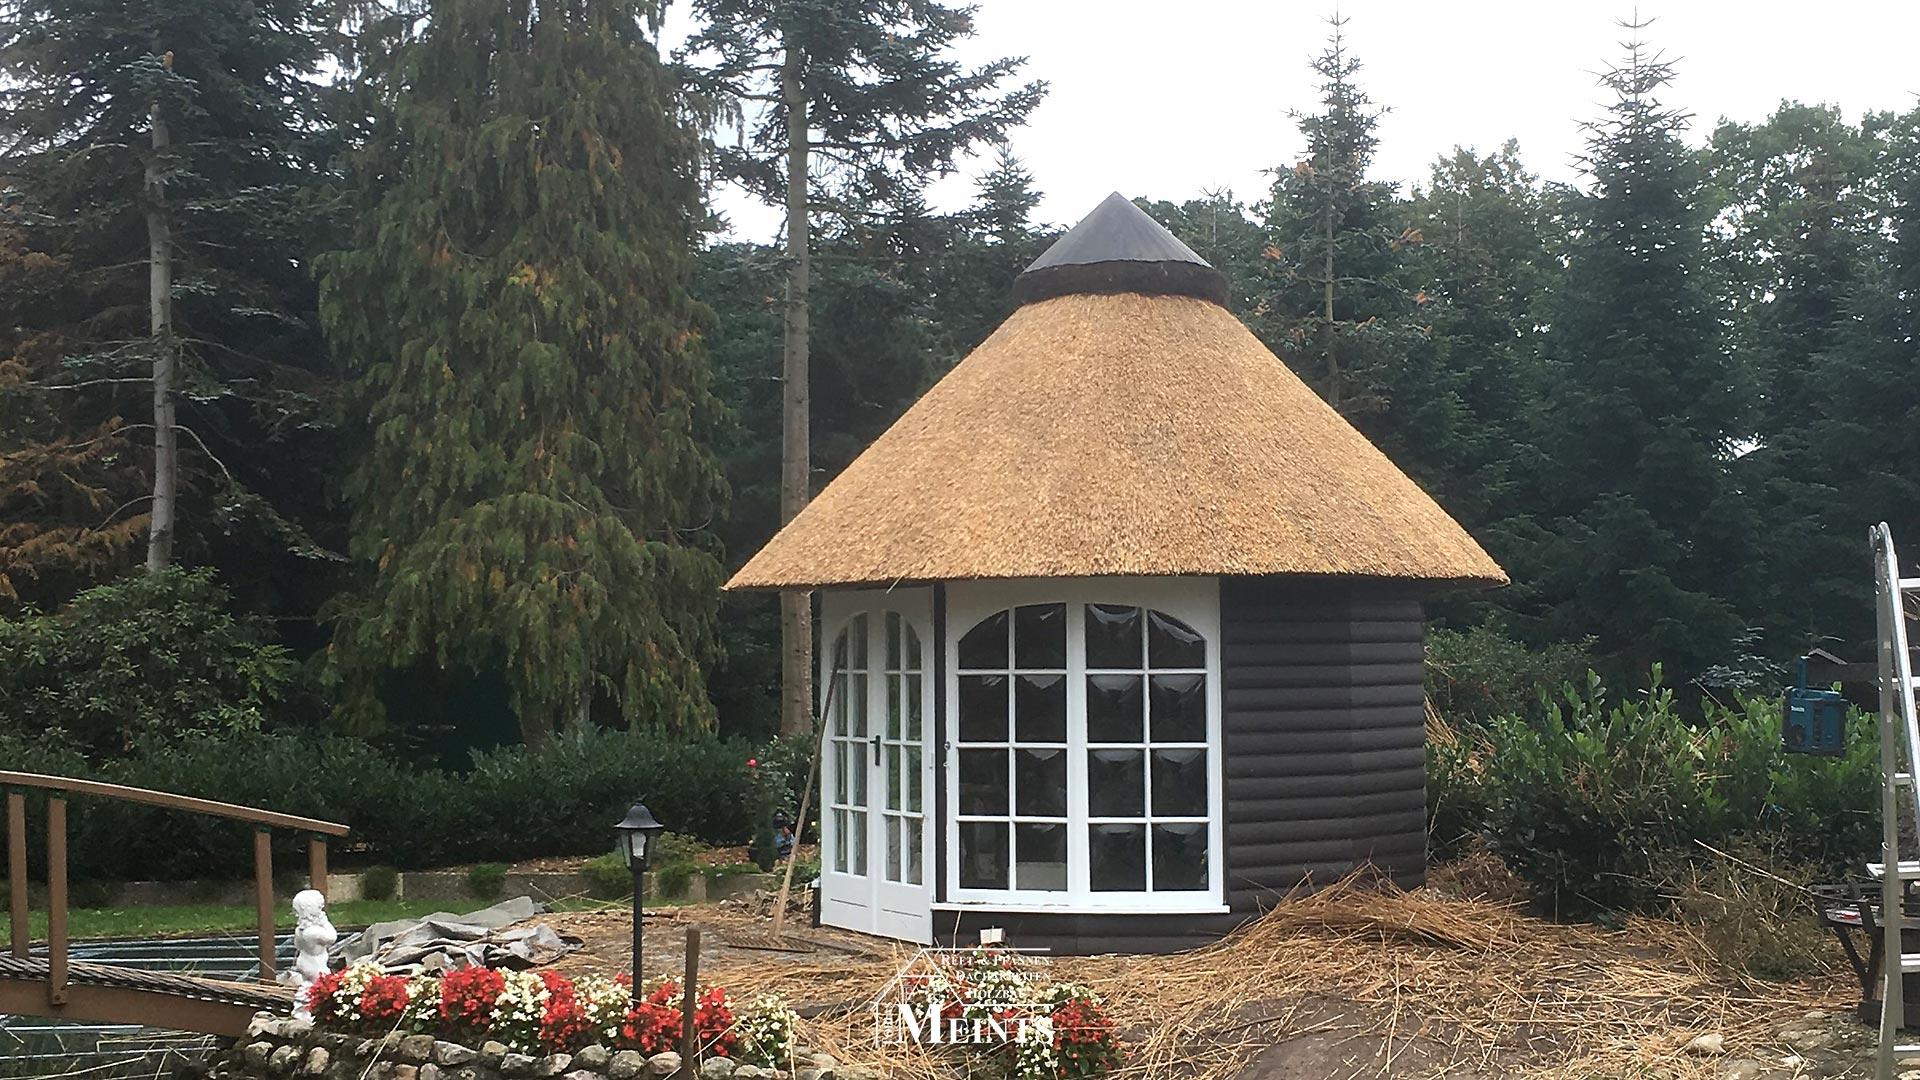 Sonderbauten Pavillon Naturreet Reetbedachung Ammerland Dachdecker Bad Zwischenahn 03